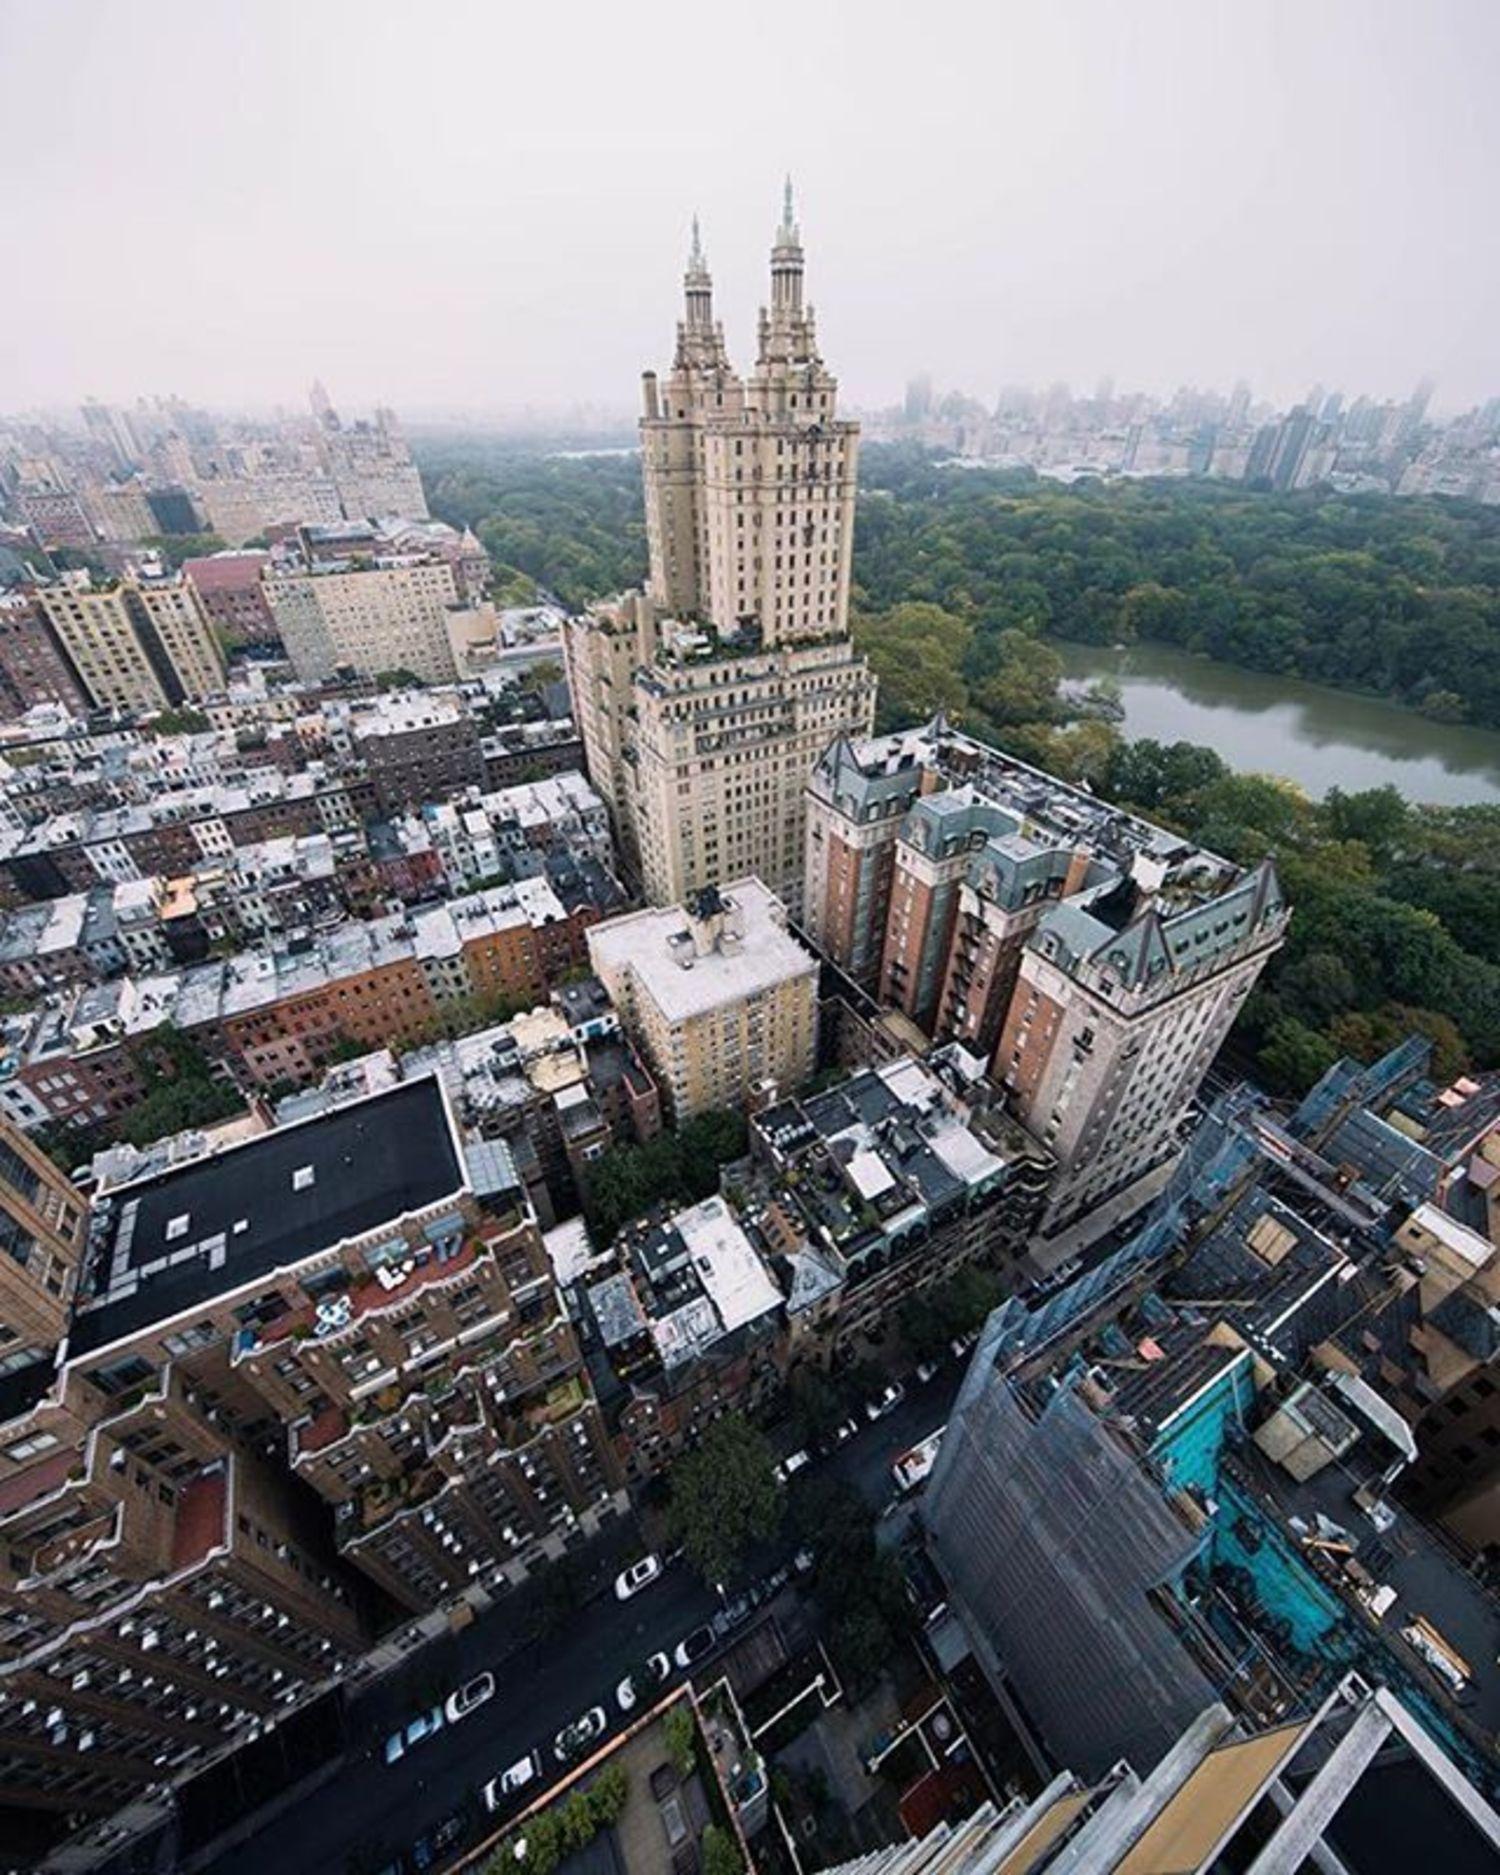 New York, New York. Photo via @opoline #newyork #newyorkcity #nyc #viewingnyc